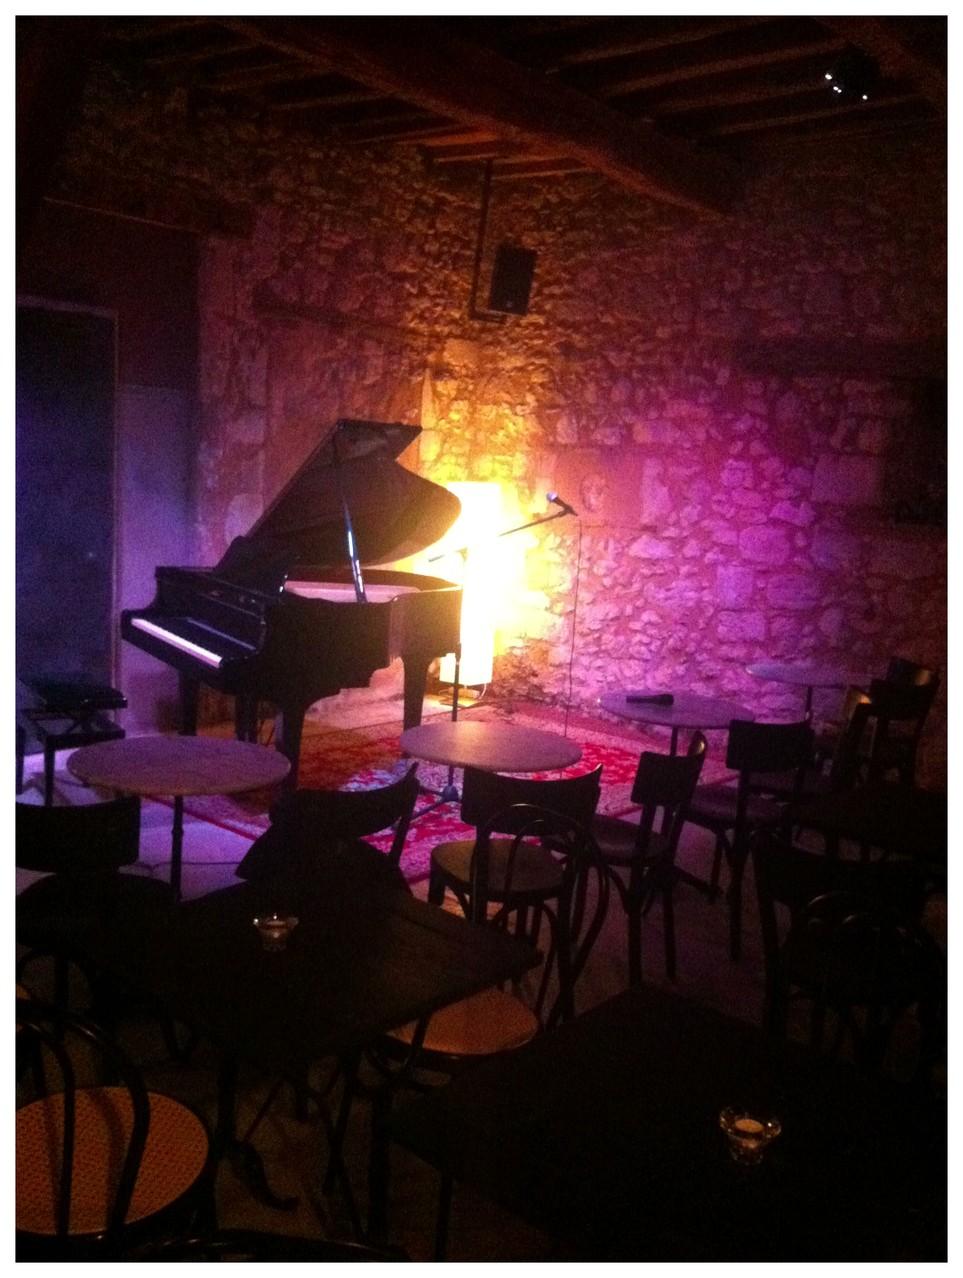 Live at Marciac - November 2012